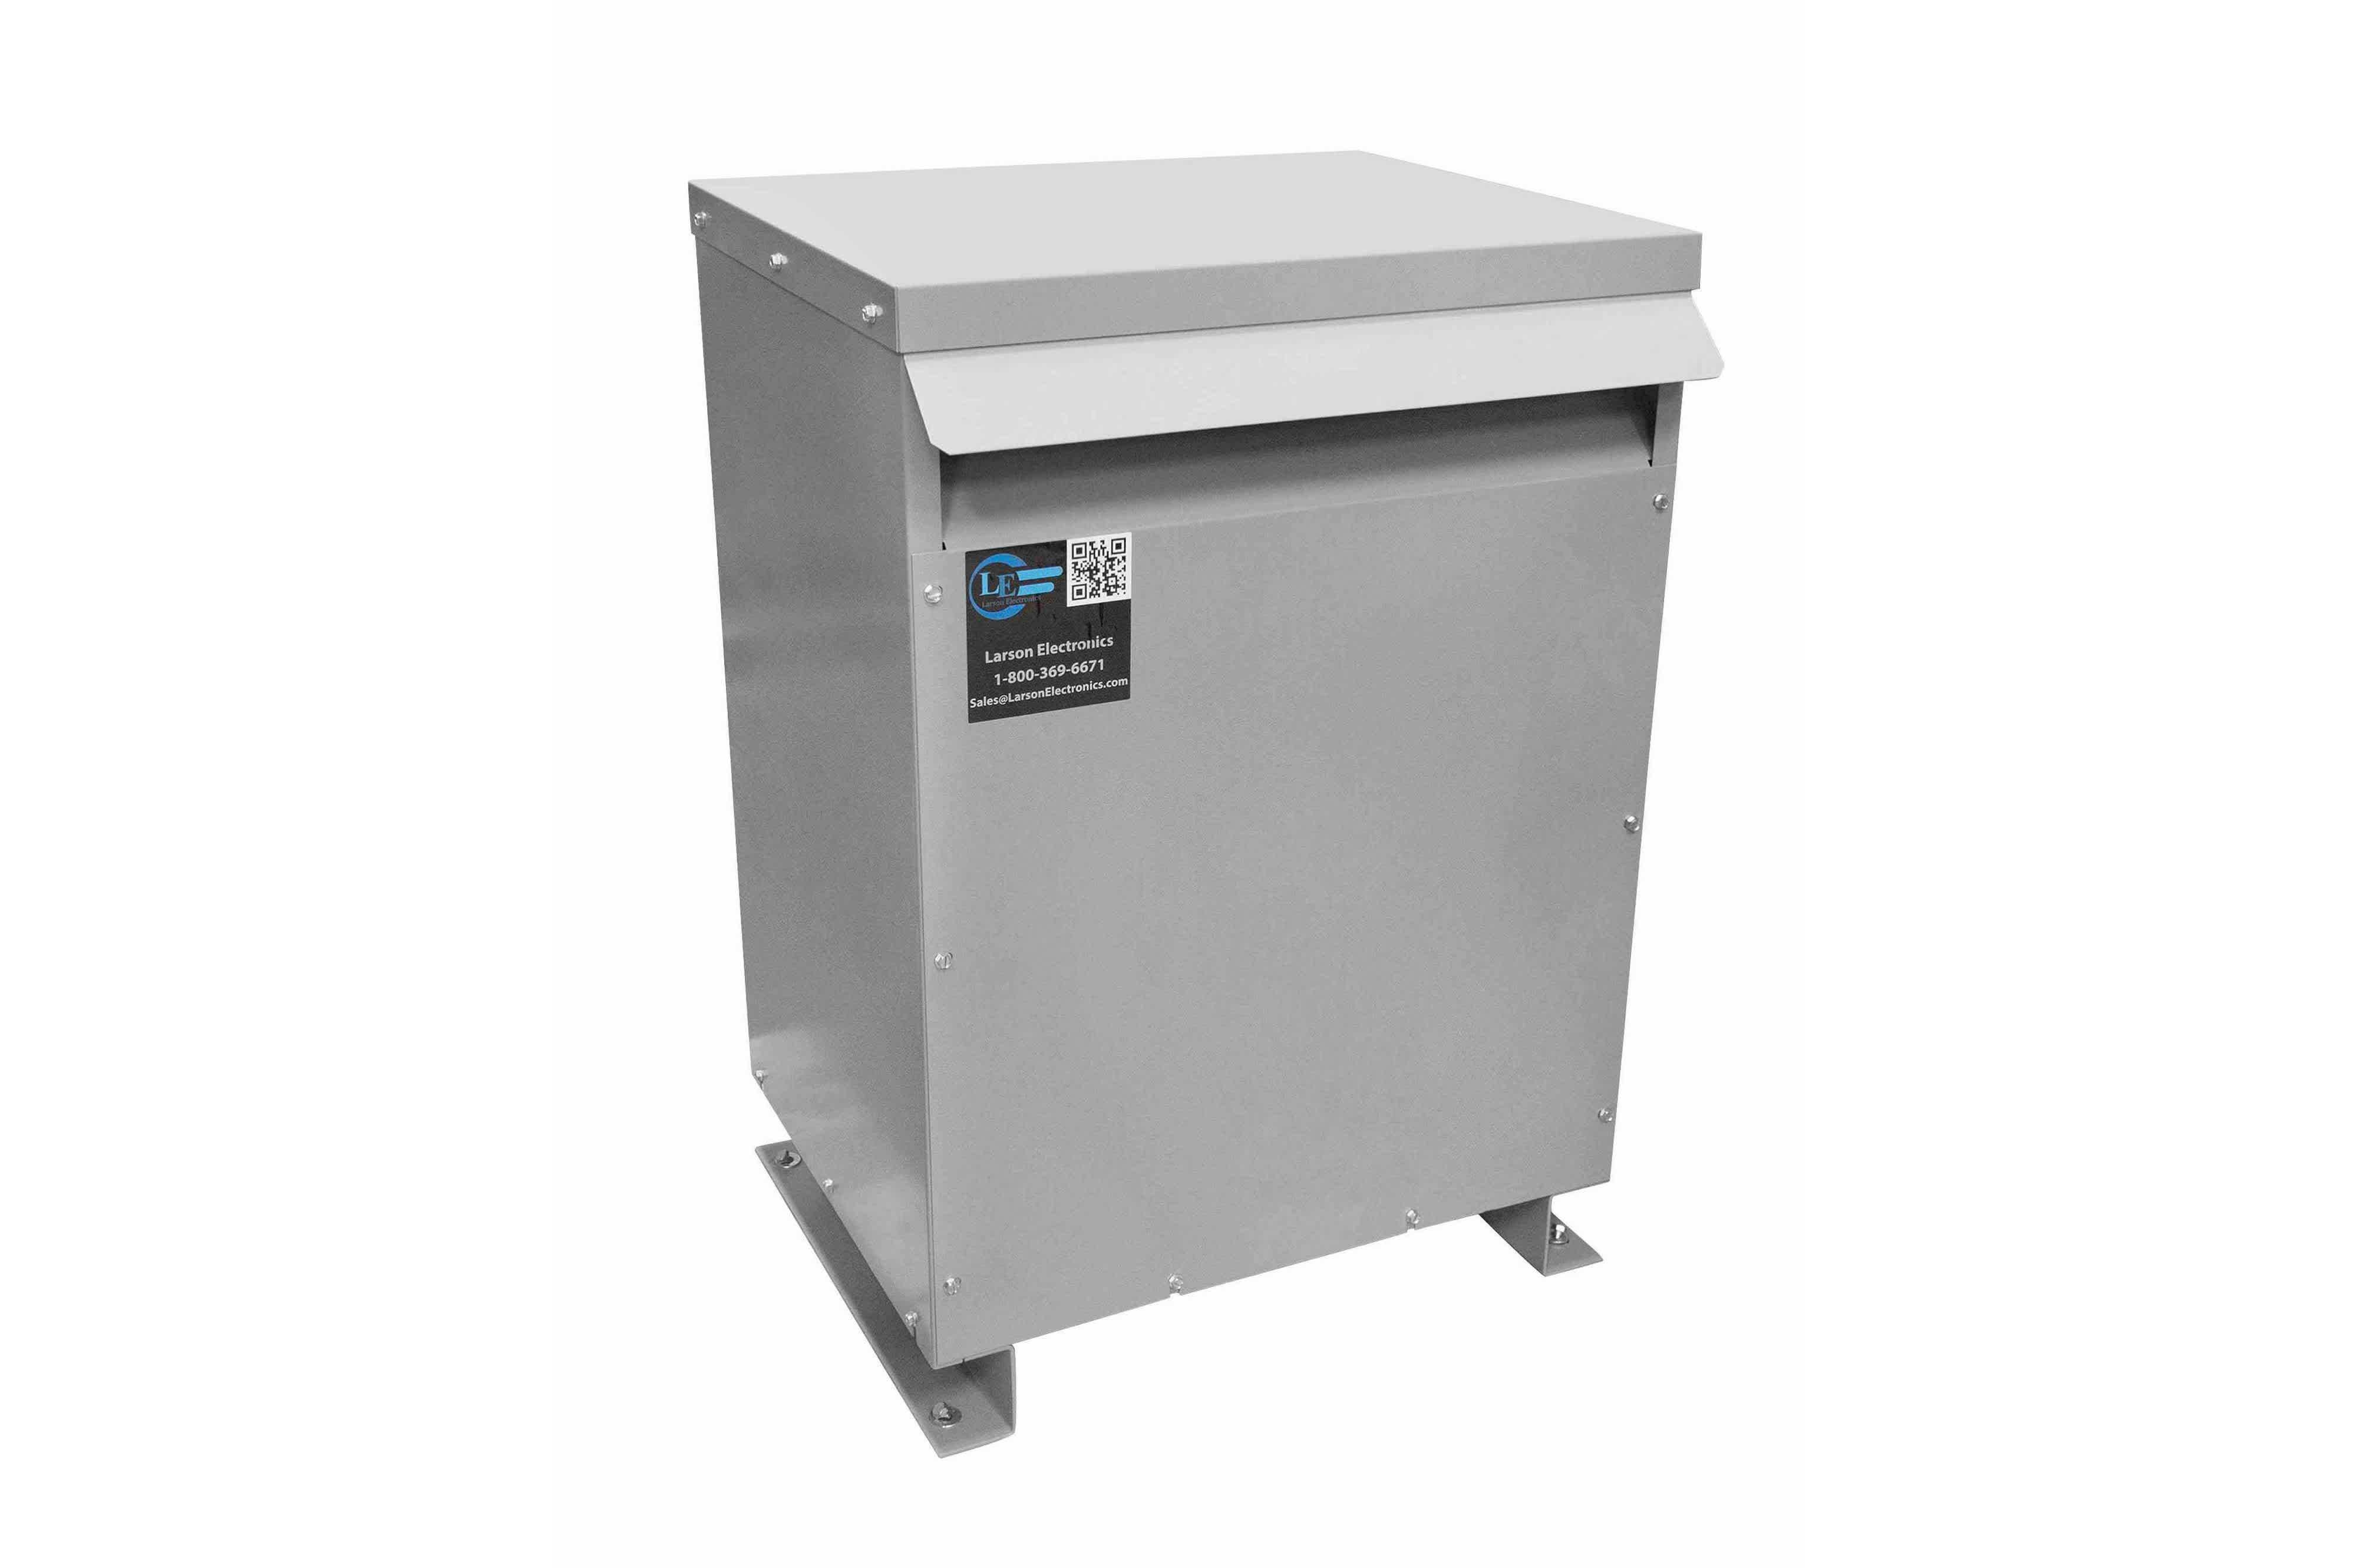 137.5 kVA 3PH Isolation Transformer, 480V Wye Primary, 380V Delta Secondary, N3R, Ventilated, 60 Hz